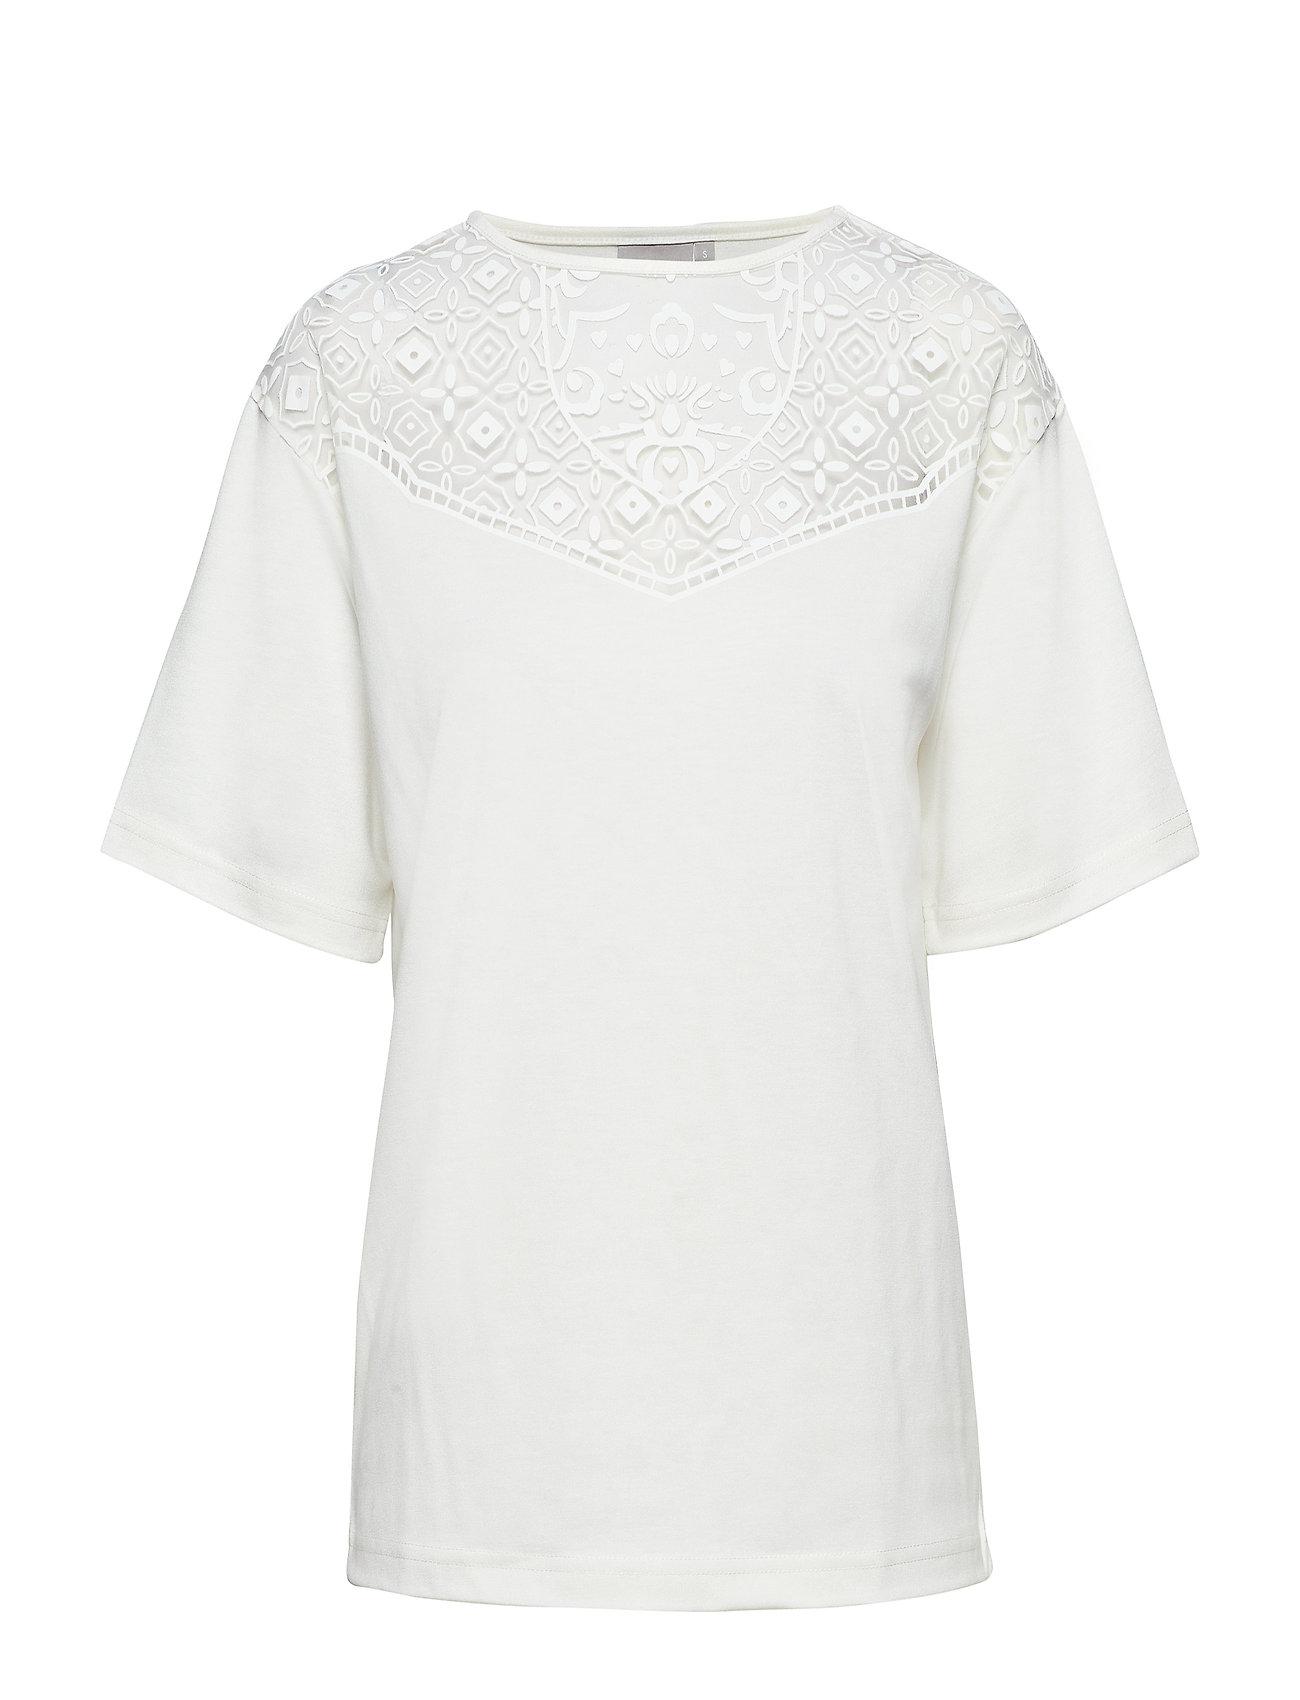 Brandtex T-shirt l/s - OFFWHITE